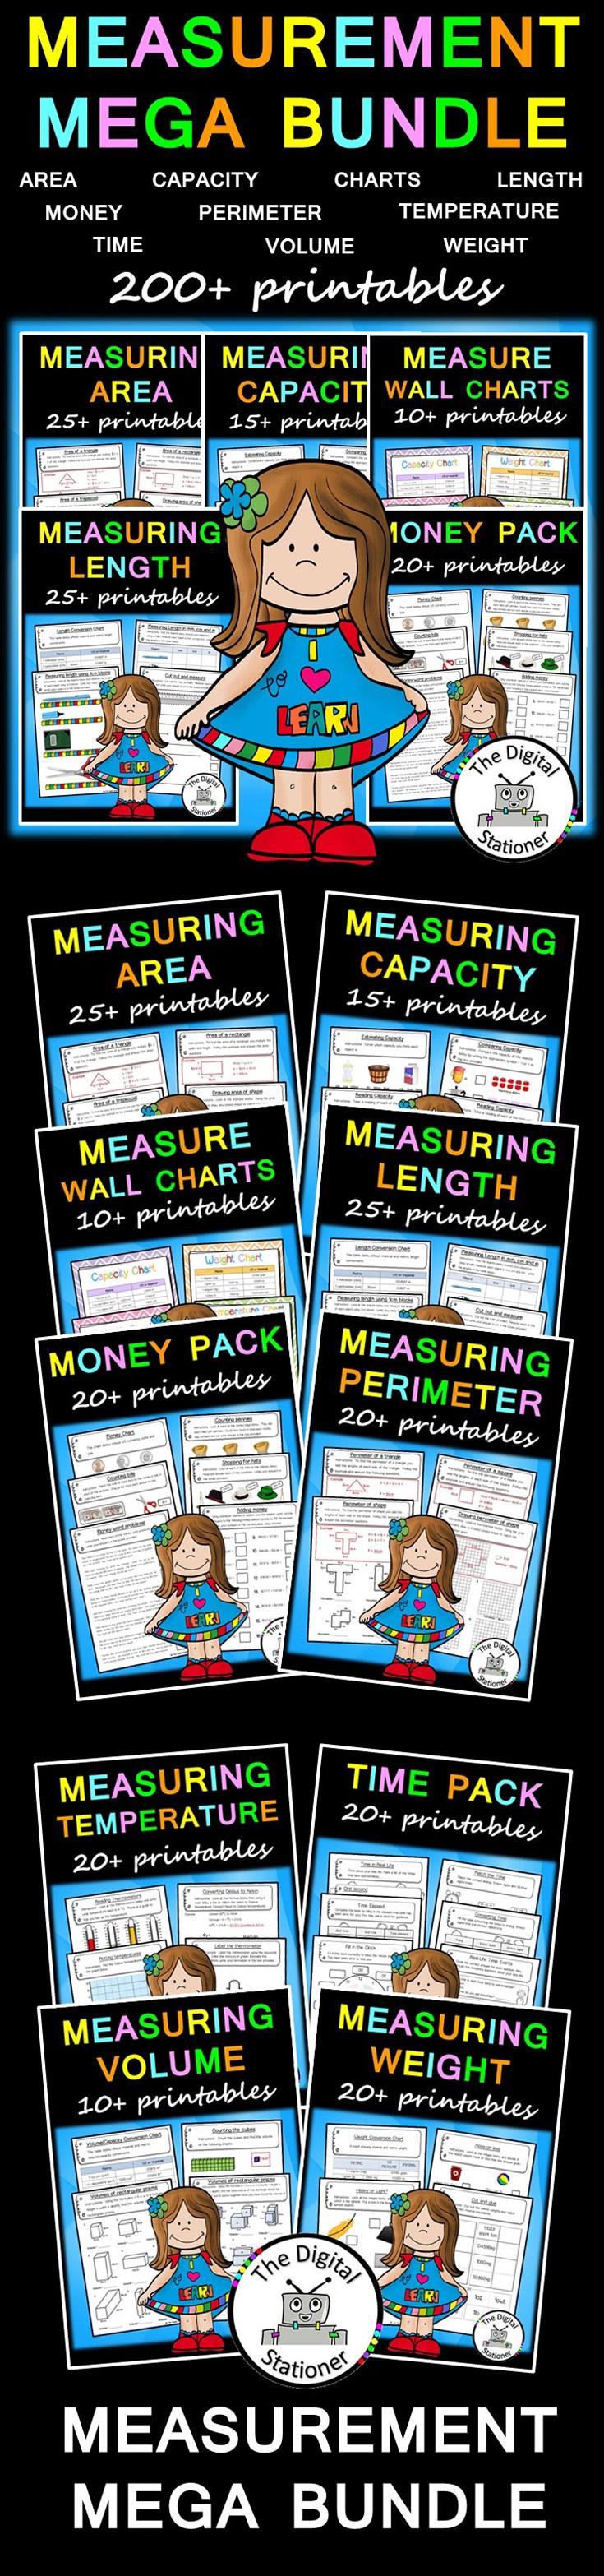 Measurement MEGA Bundle – 200+ printables | Numeracy, Math and ...